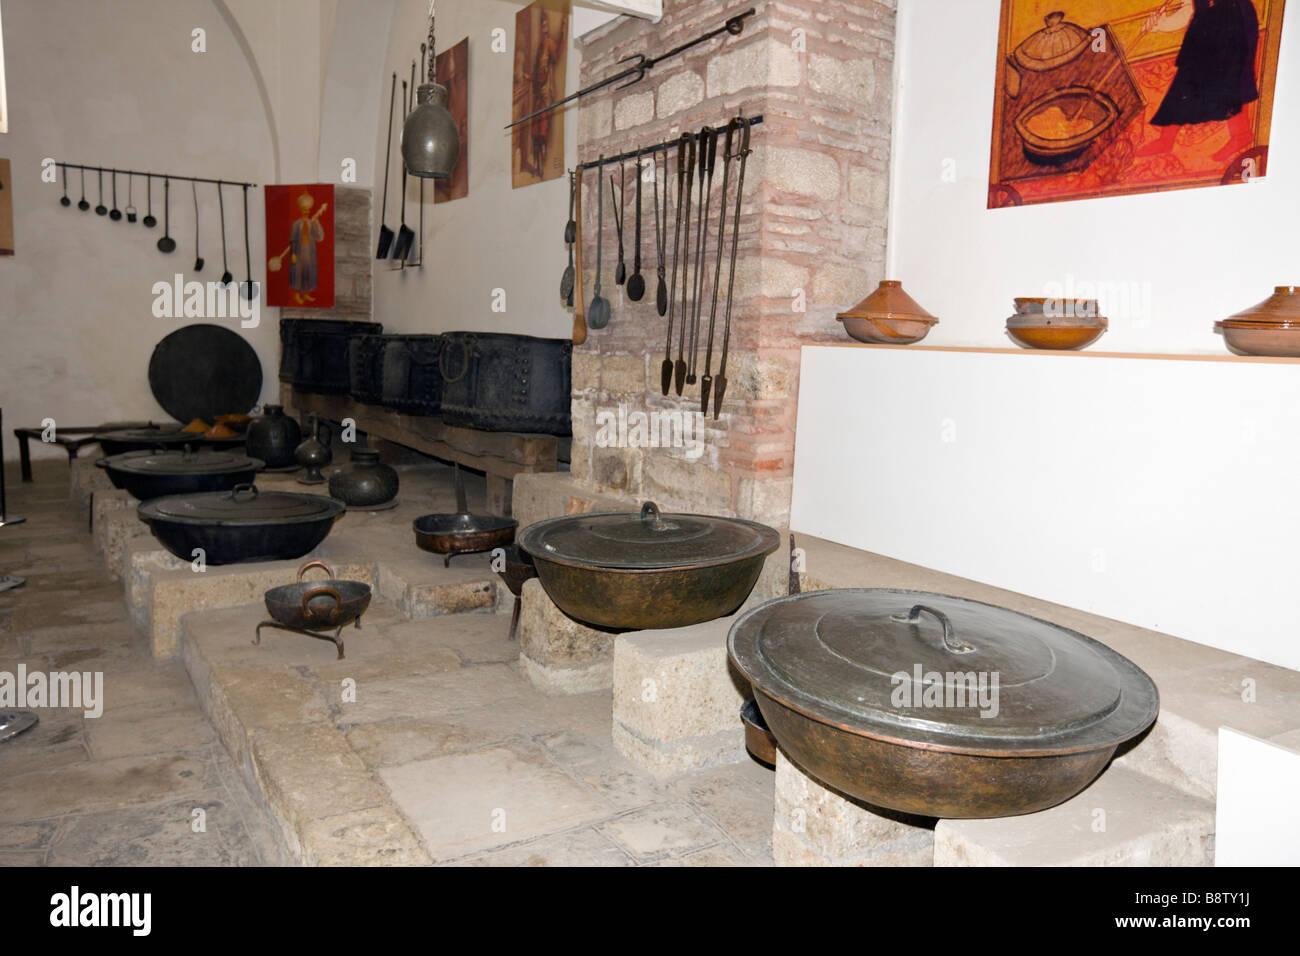 Topkapi Palace Kitchen Istanbul Turkey Stock Photo: 22675678 - Alamy